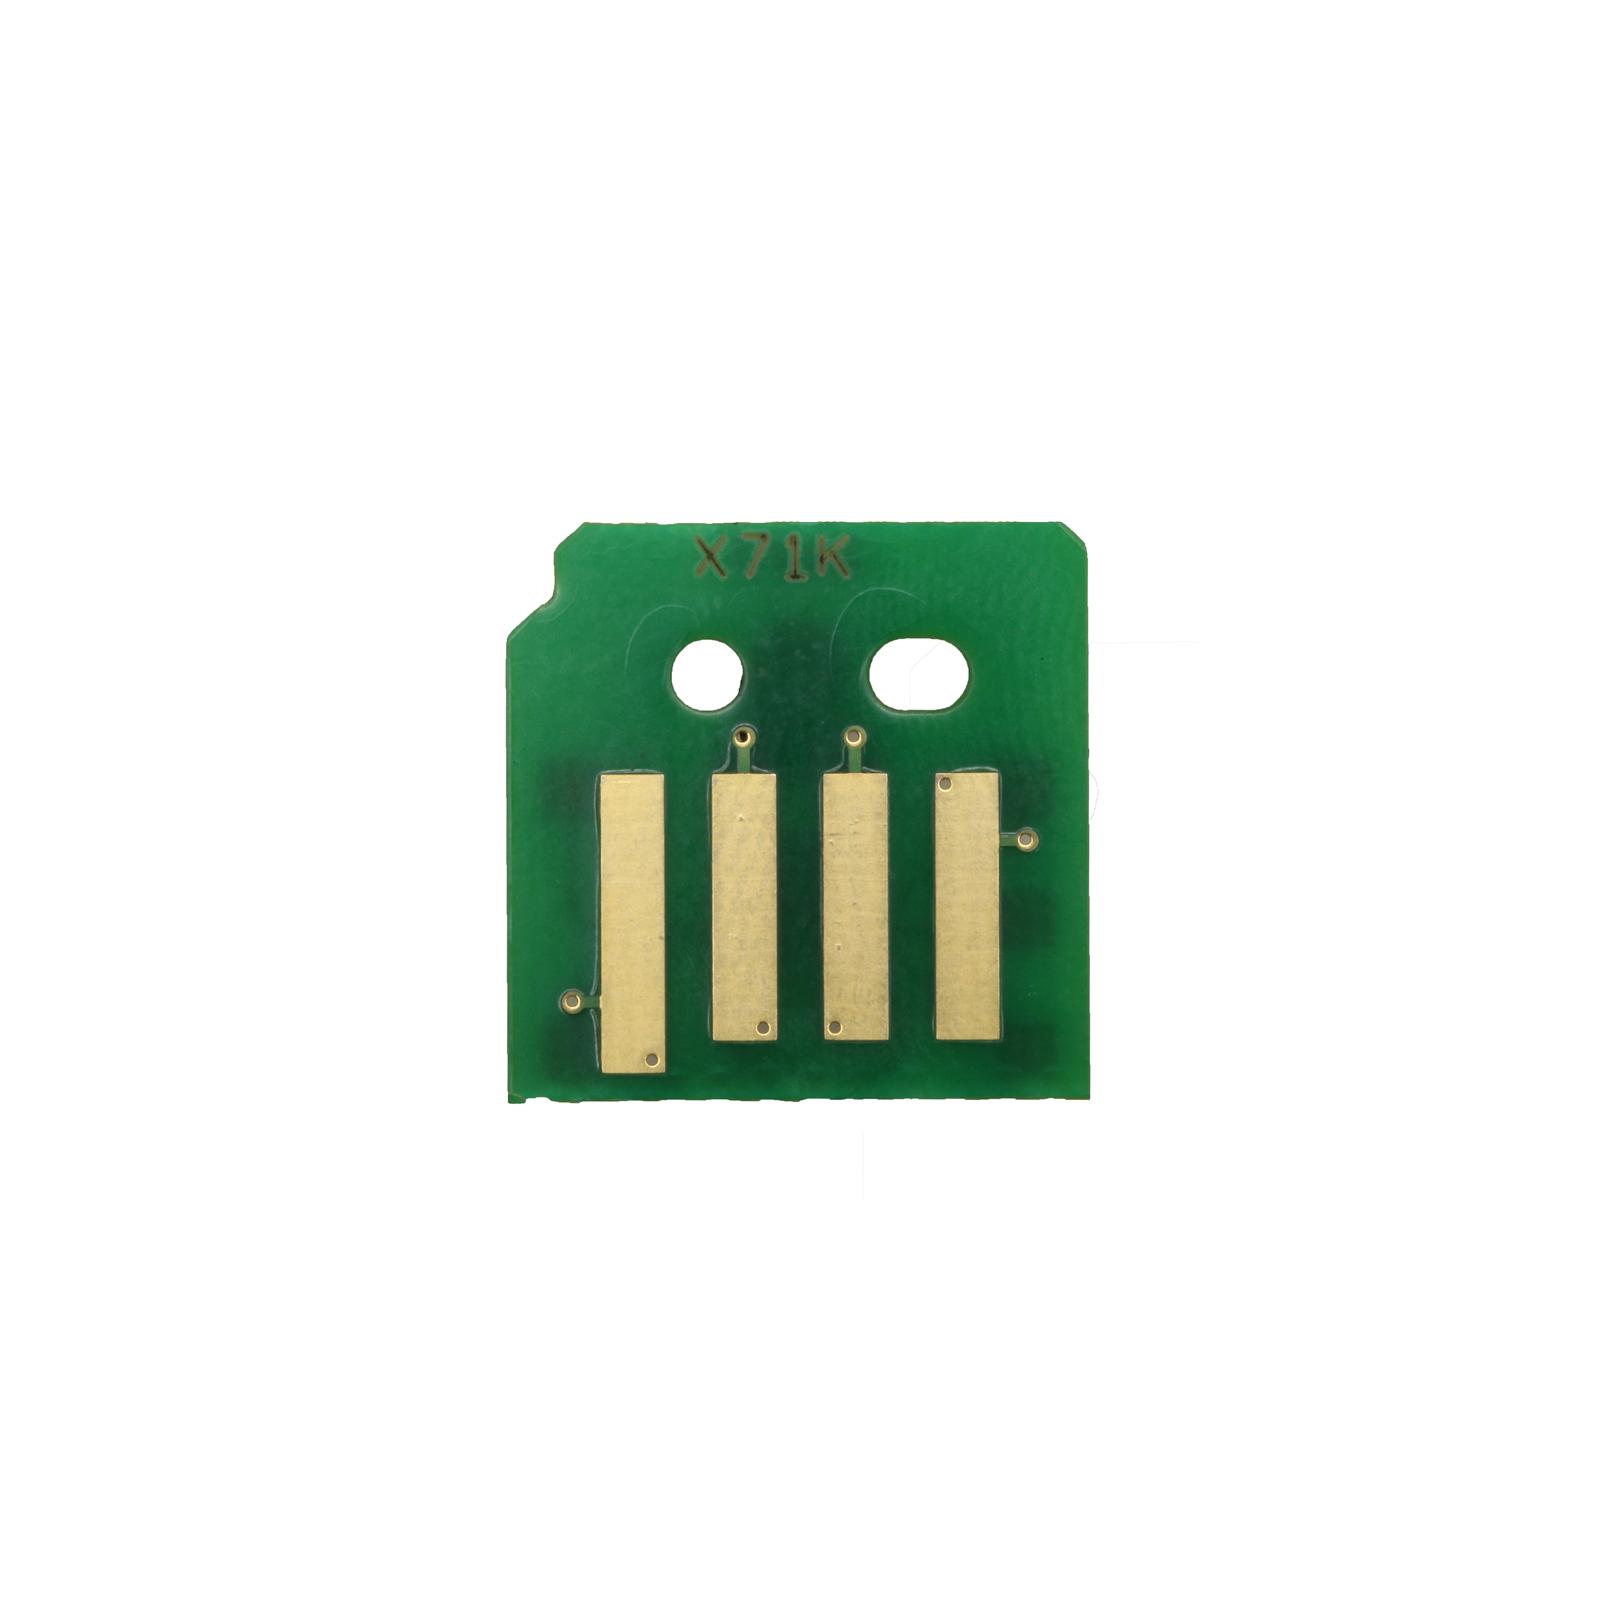 Чип для картриджа Xerox Phaser 7800 (106R01570) 17.2k cyan Static Control (X7800CP-CLA)